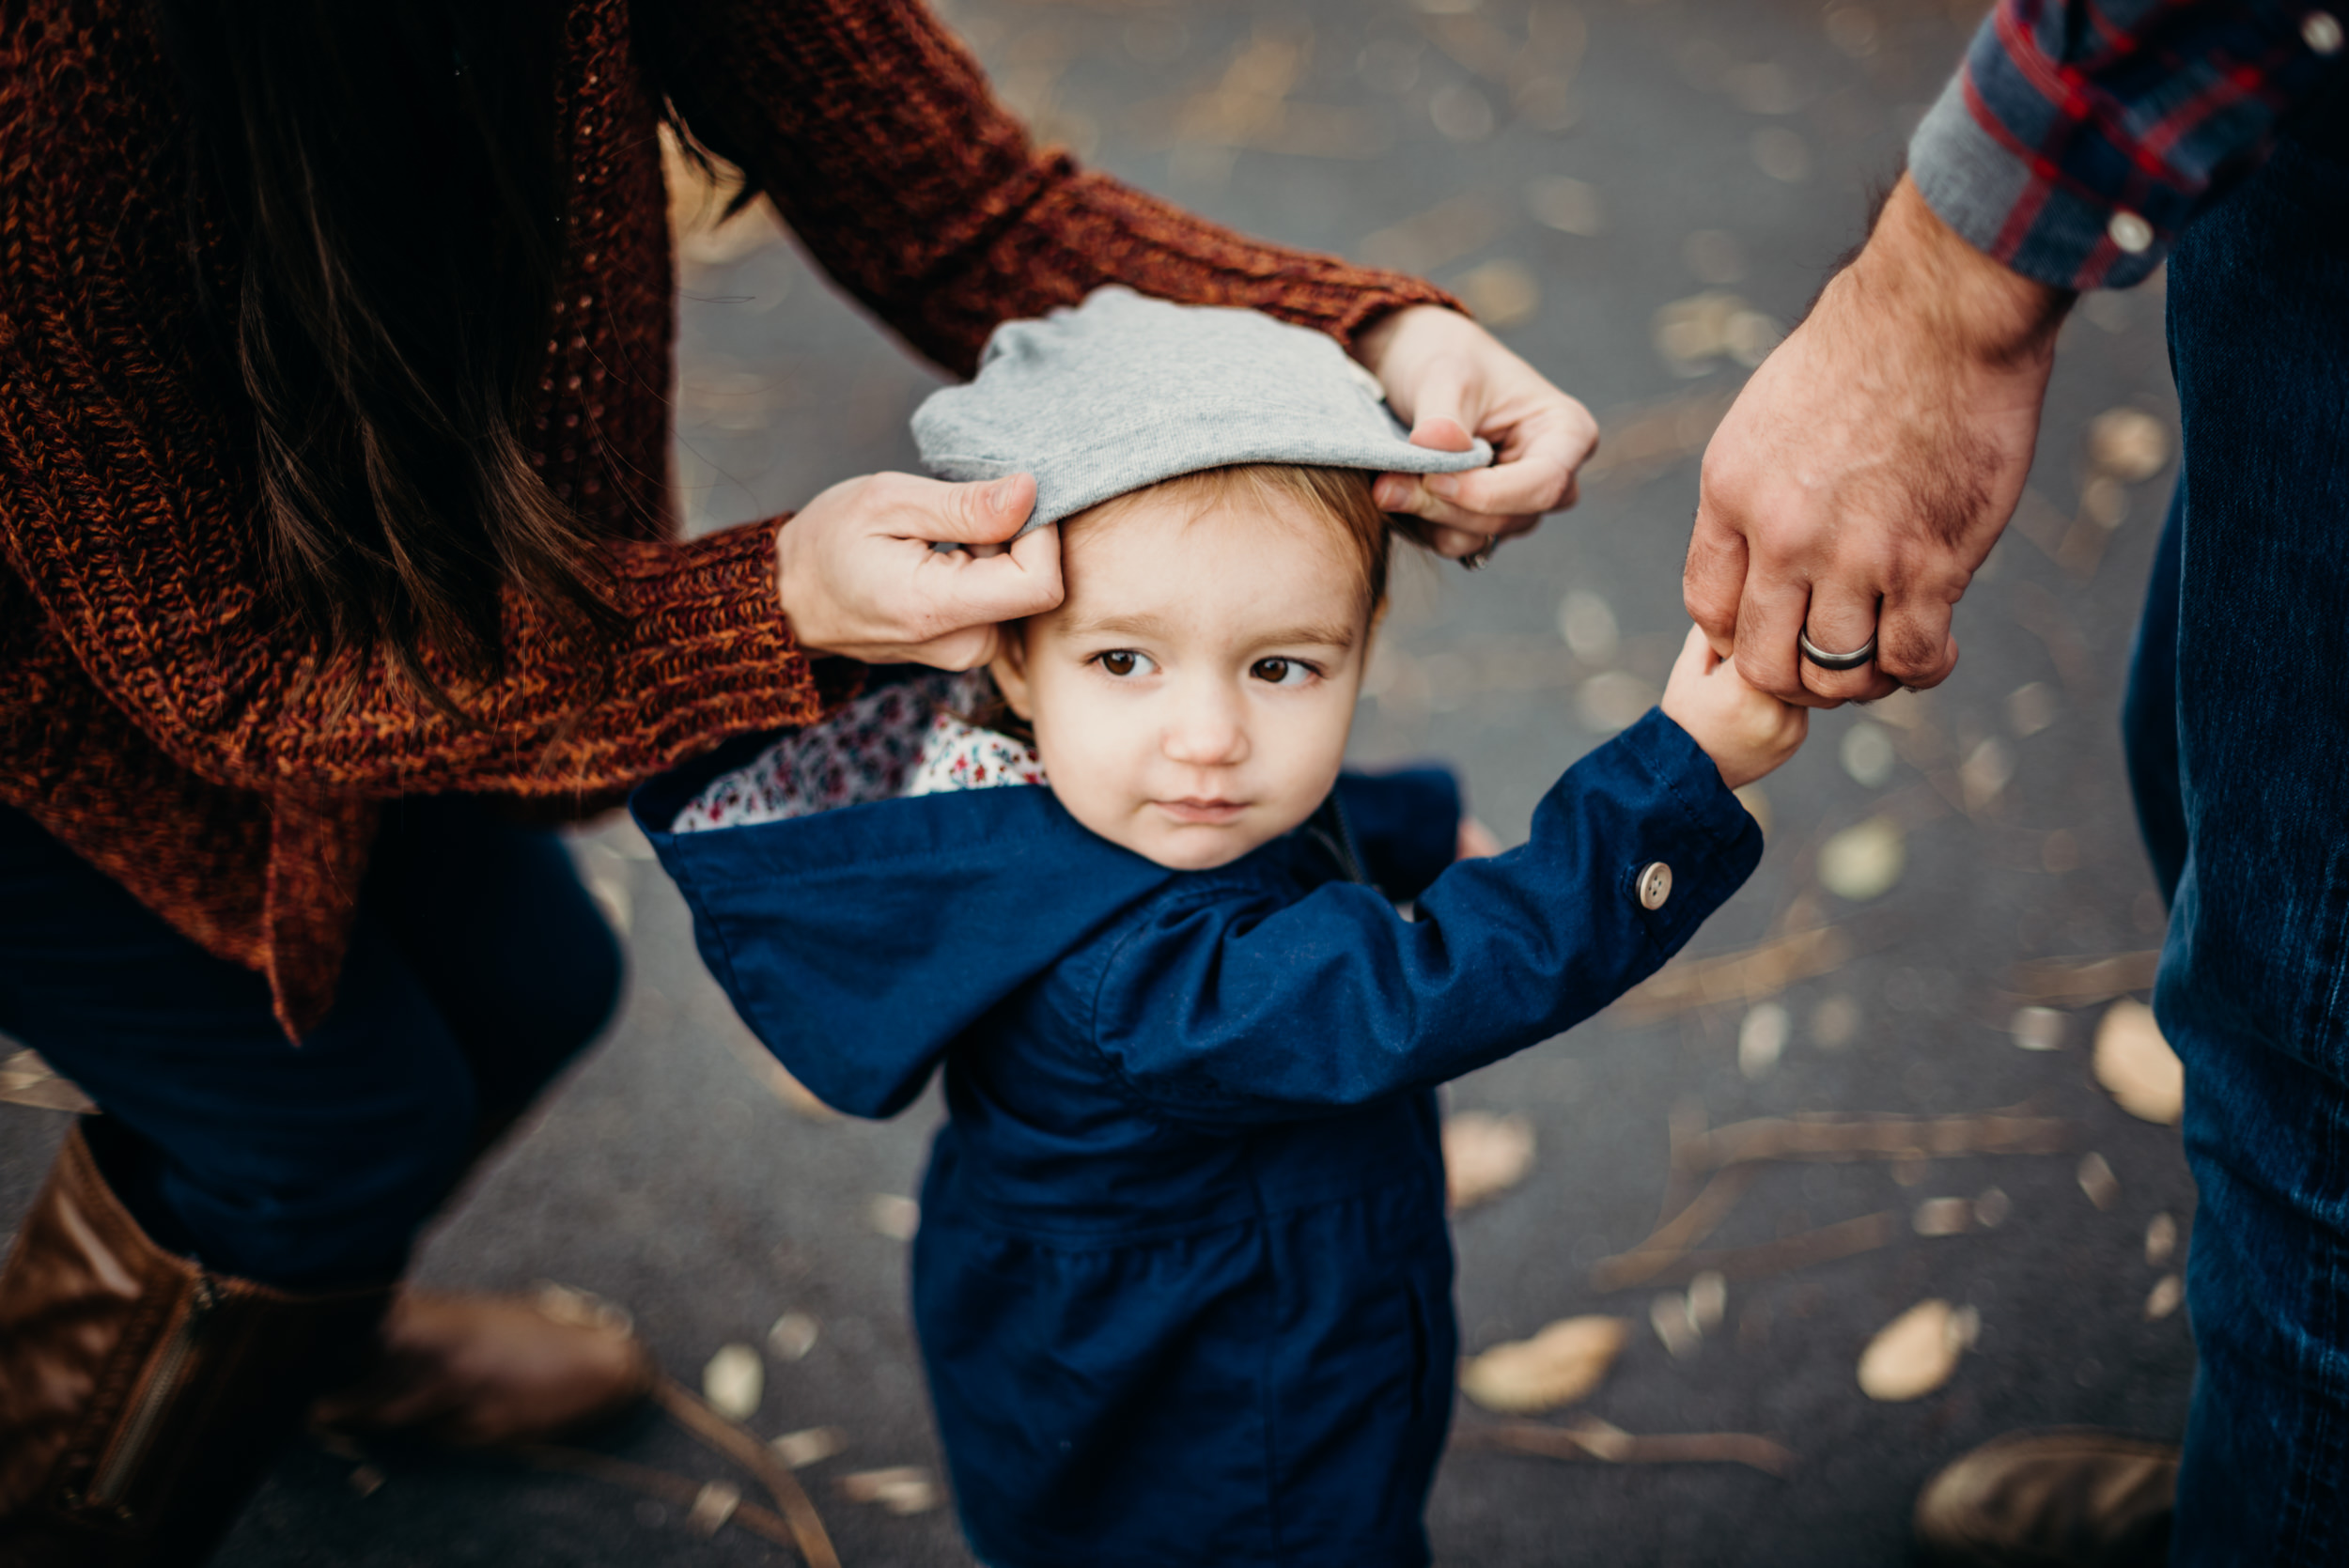 bearlake-idahophotographer-utahphotographer-engagementphotographer-web9-79.jpg